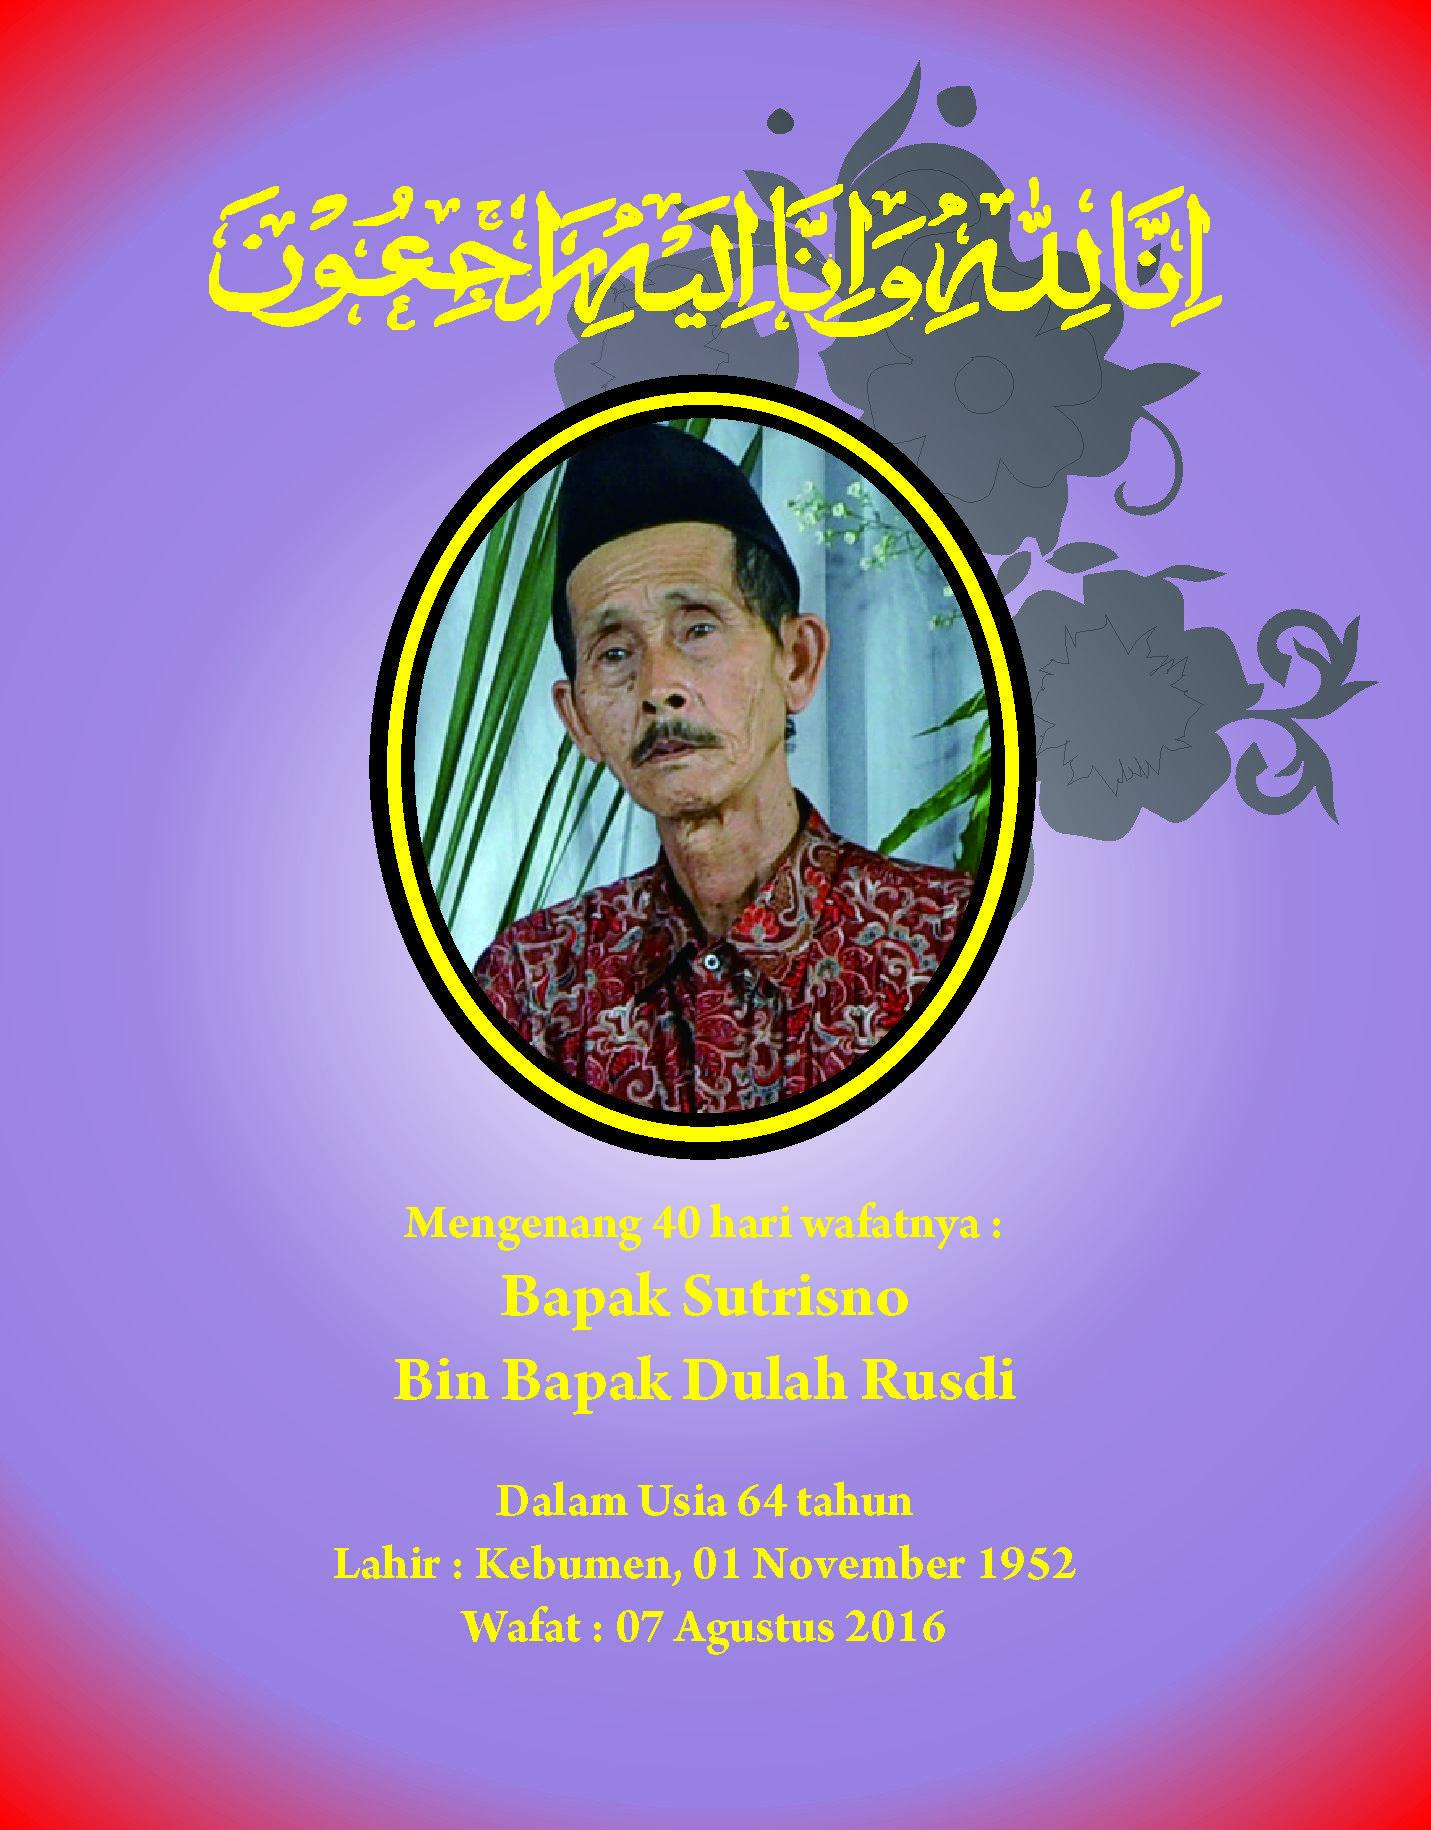 Yang Bagus 0819 1504 4167 Tempat Cetak Buku Yasin Kosongan Surabaya Jogja Buku Sampul Buku Pencetakan